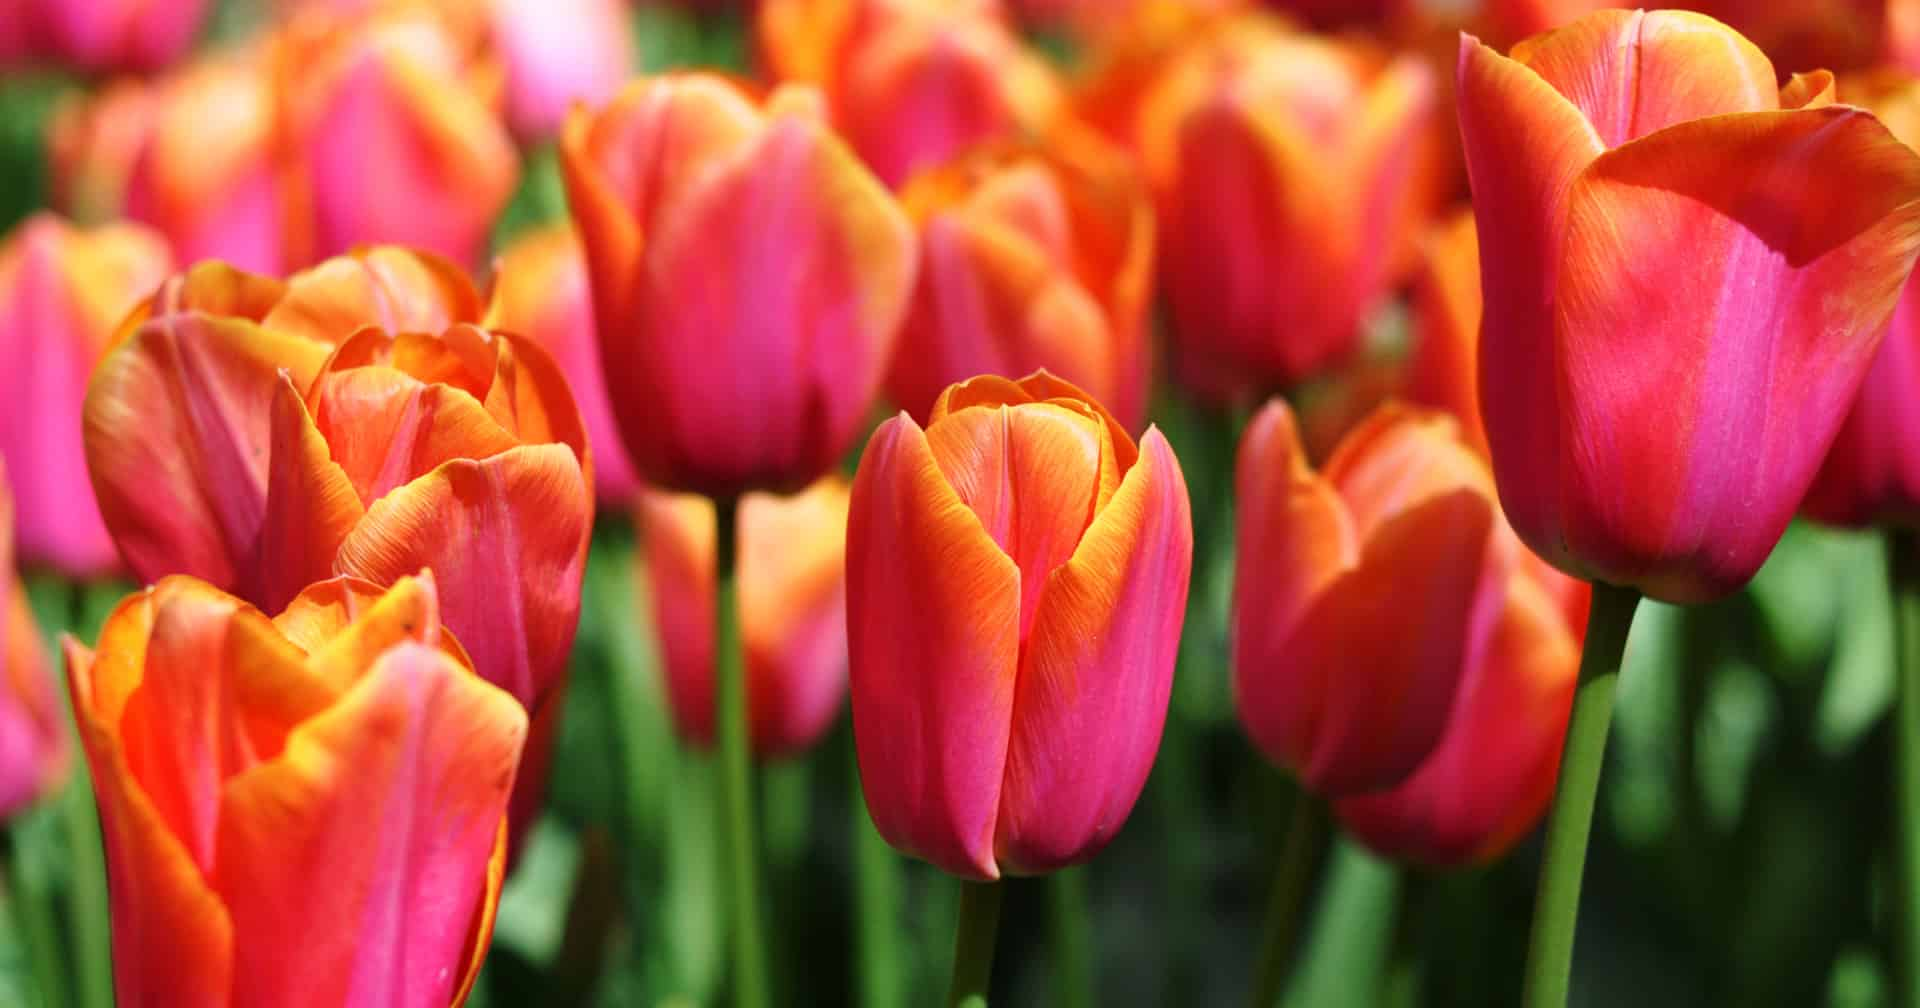 virag tulipan